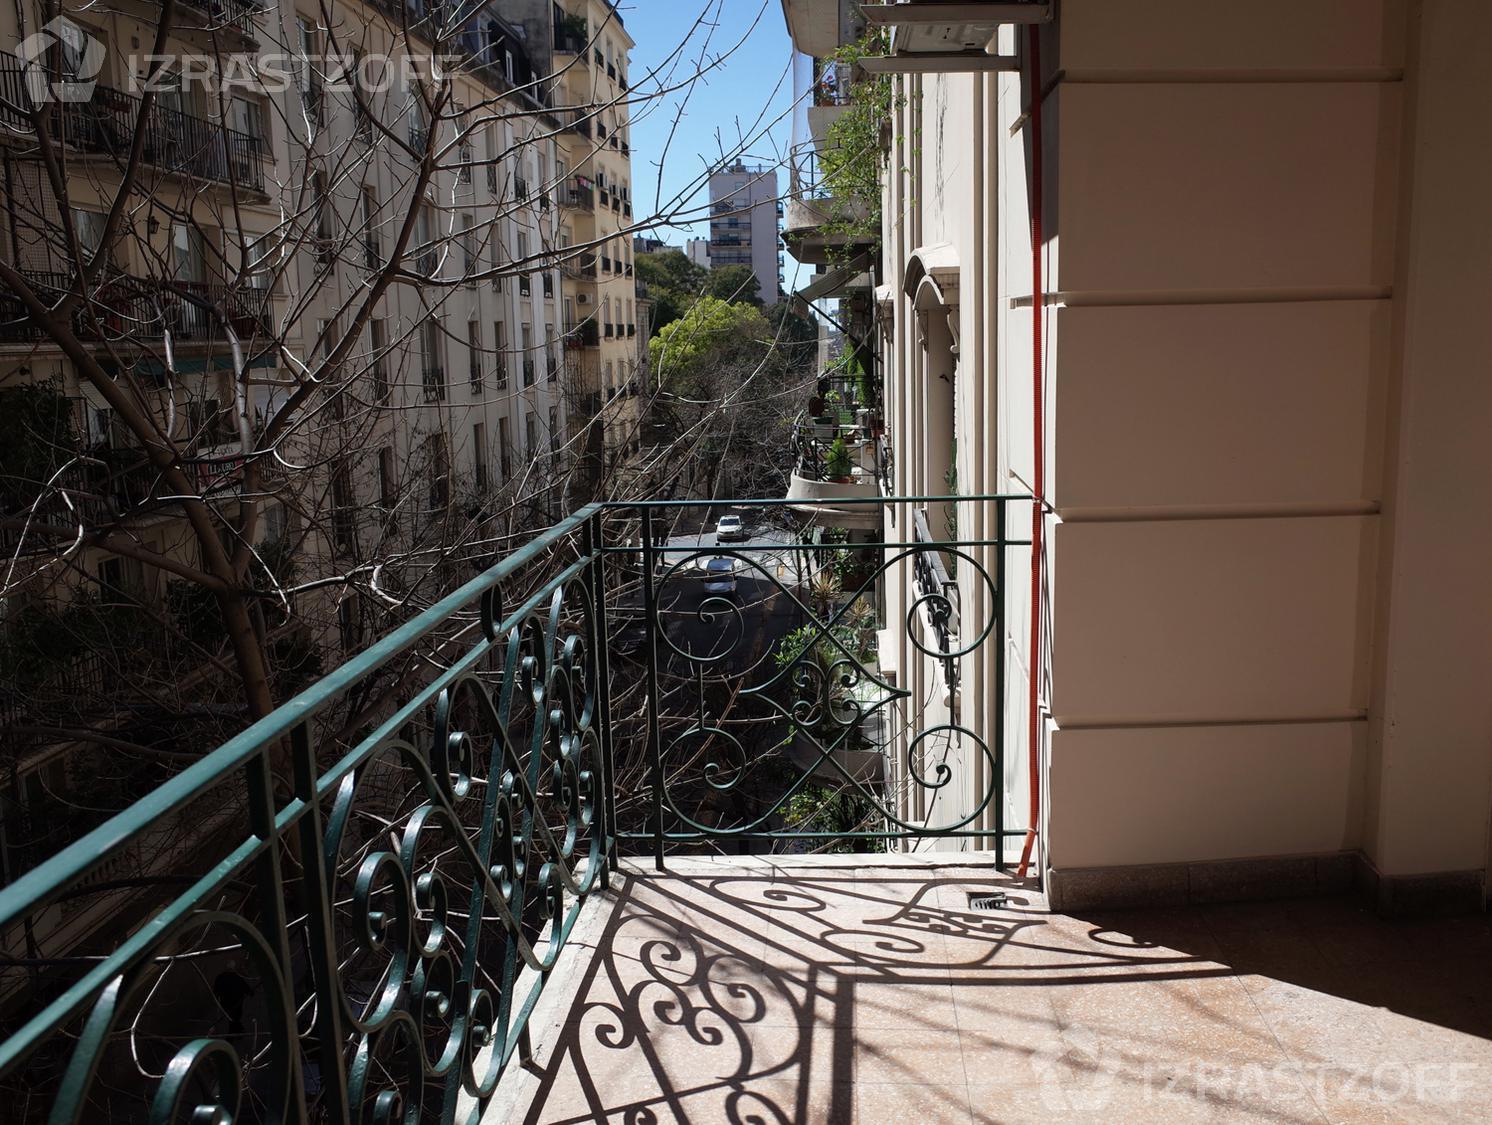 Departamento-Venta-Recoleta-Montevideo al 1700 e/ Quintana y Alvear